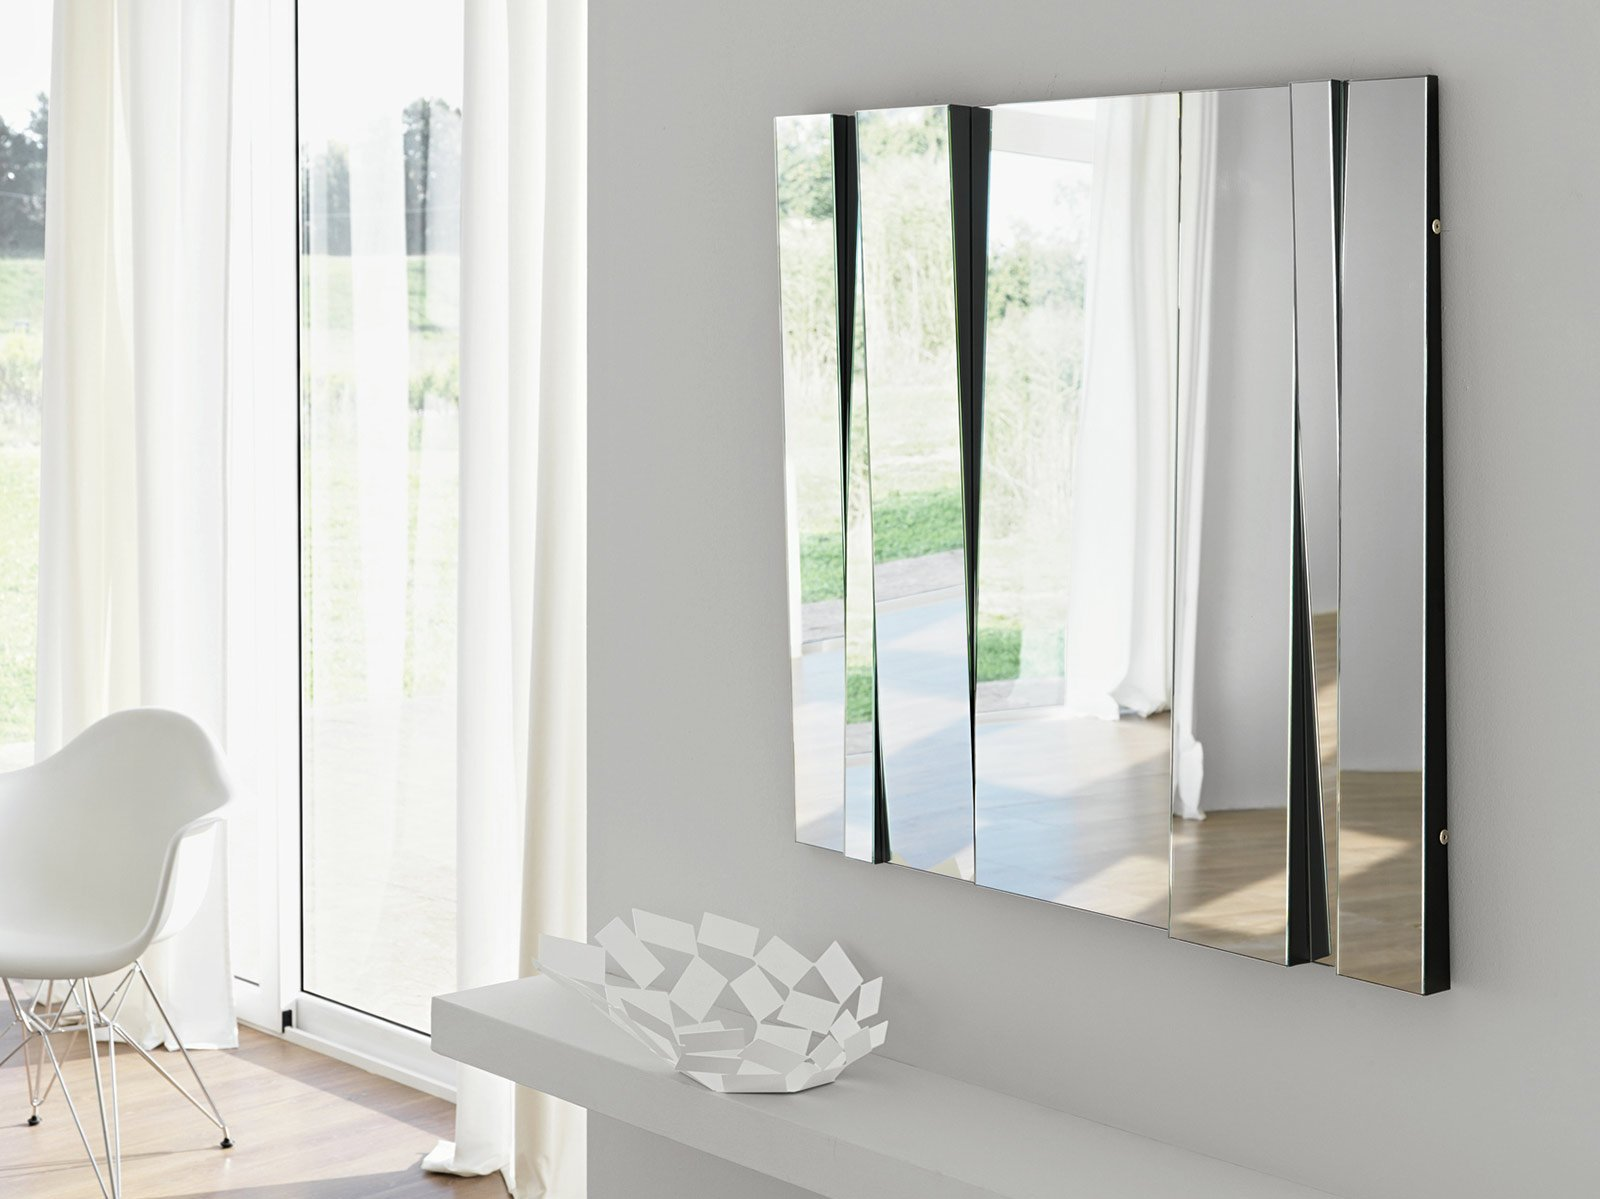 Specchi. Questione di riflessi - Cose di Casa